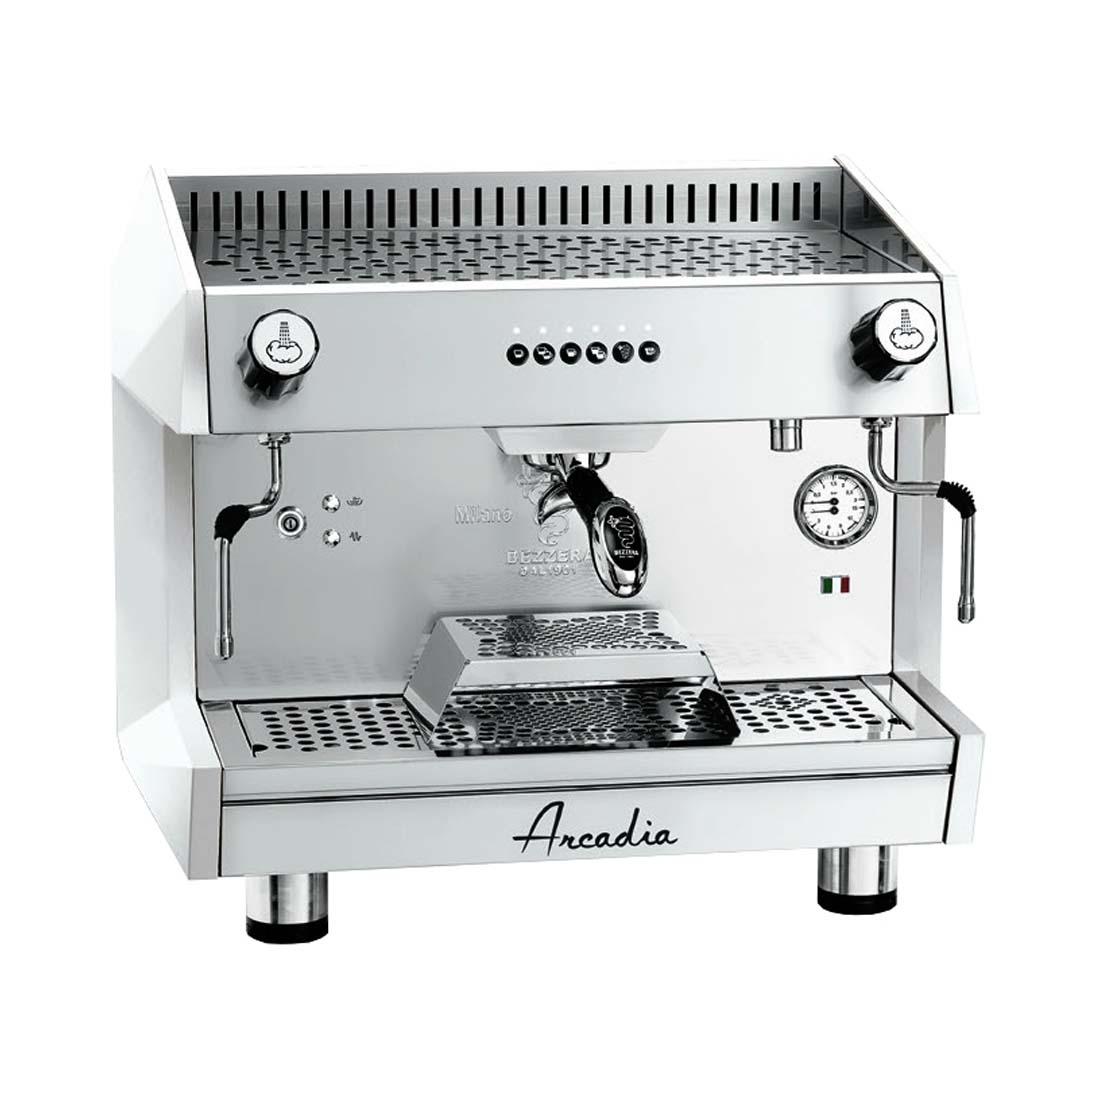 ARCADIA Professional Espresso coffee machine SS polish white 1 Group - ARCADIA-G1